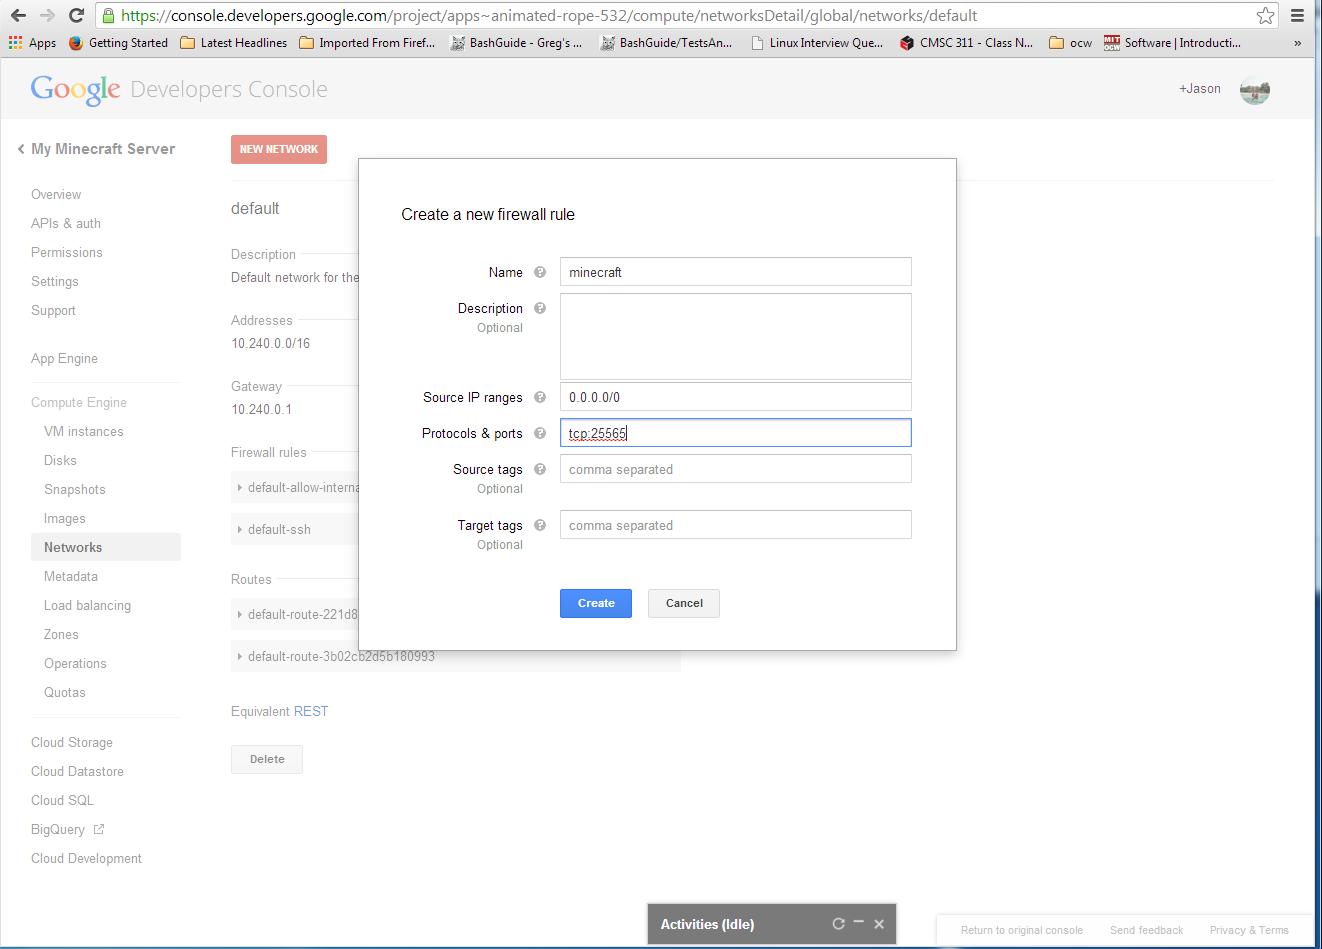 Unix Admin Online: How to run a minecraft server in Google